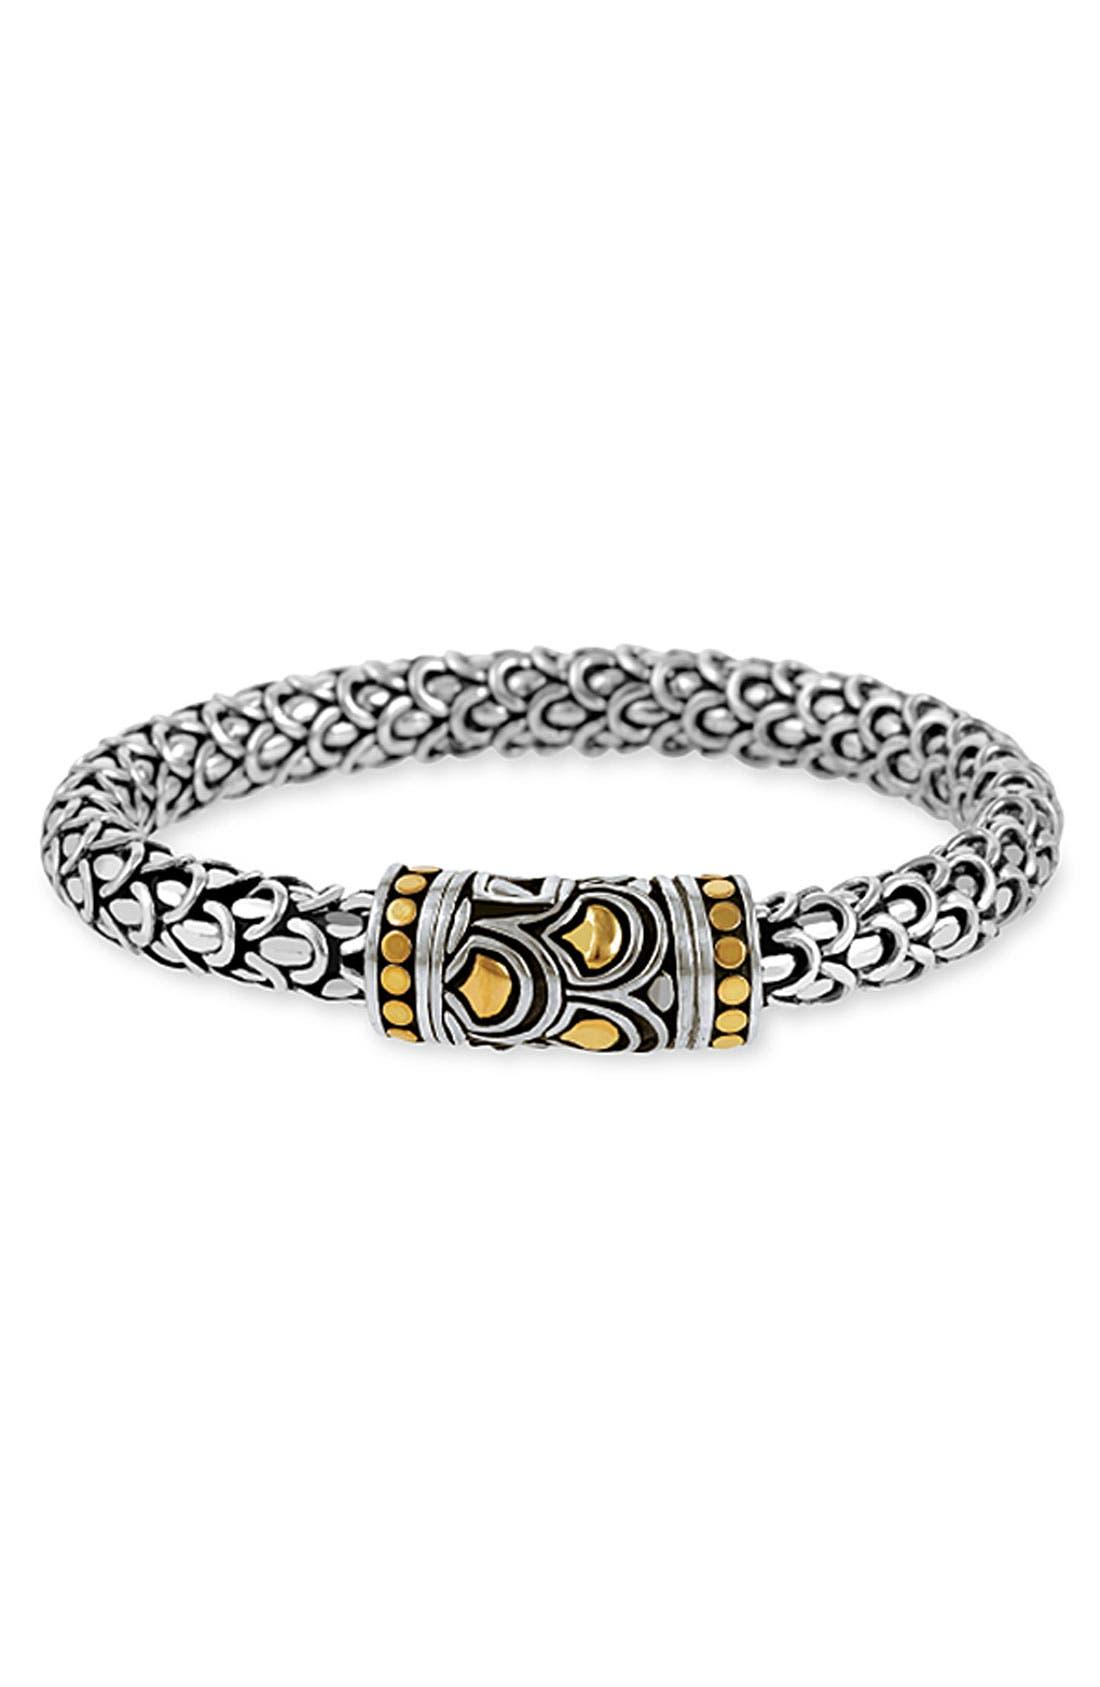 Main Image - John Hardy 'Naga' Silver & Gold Bracelet